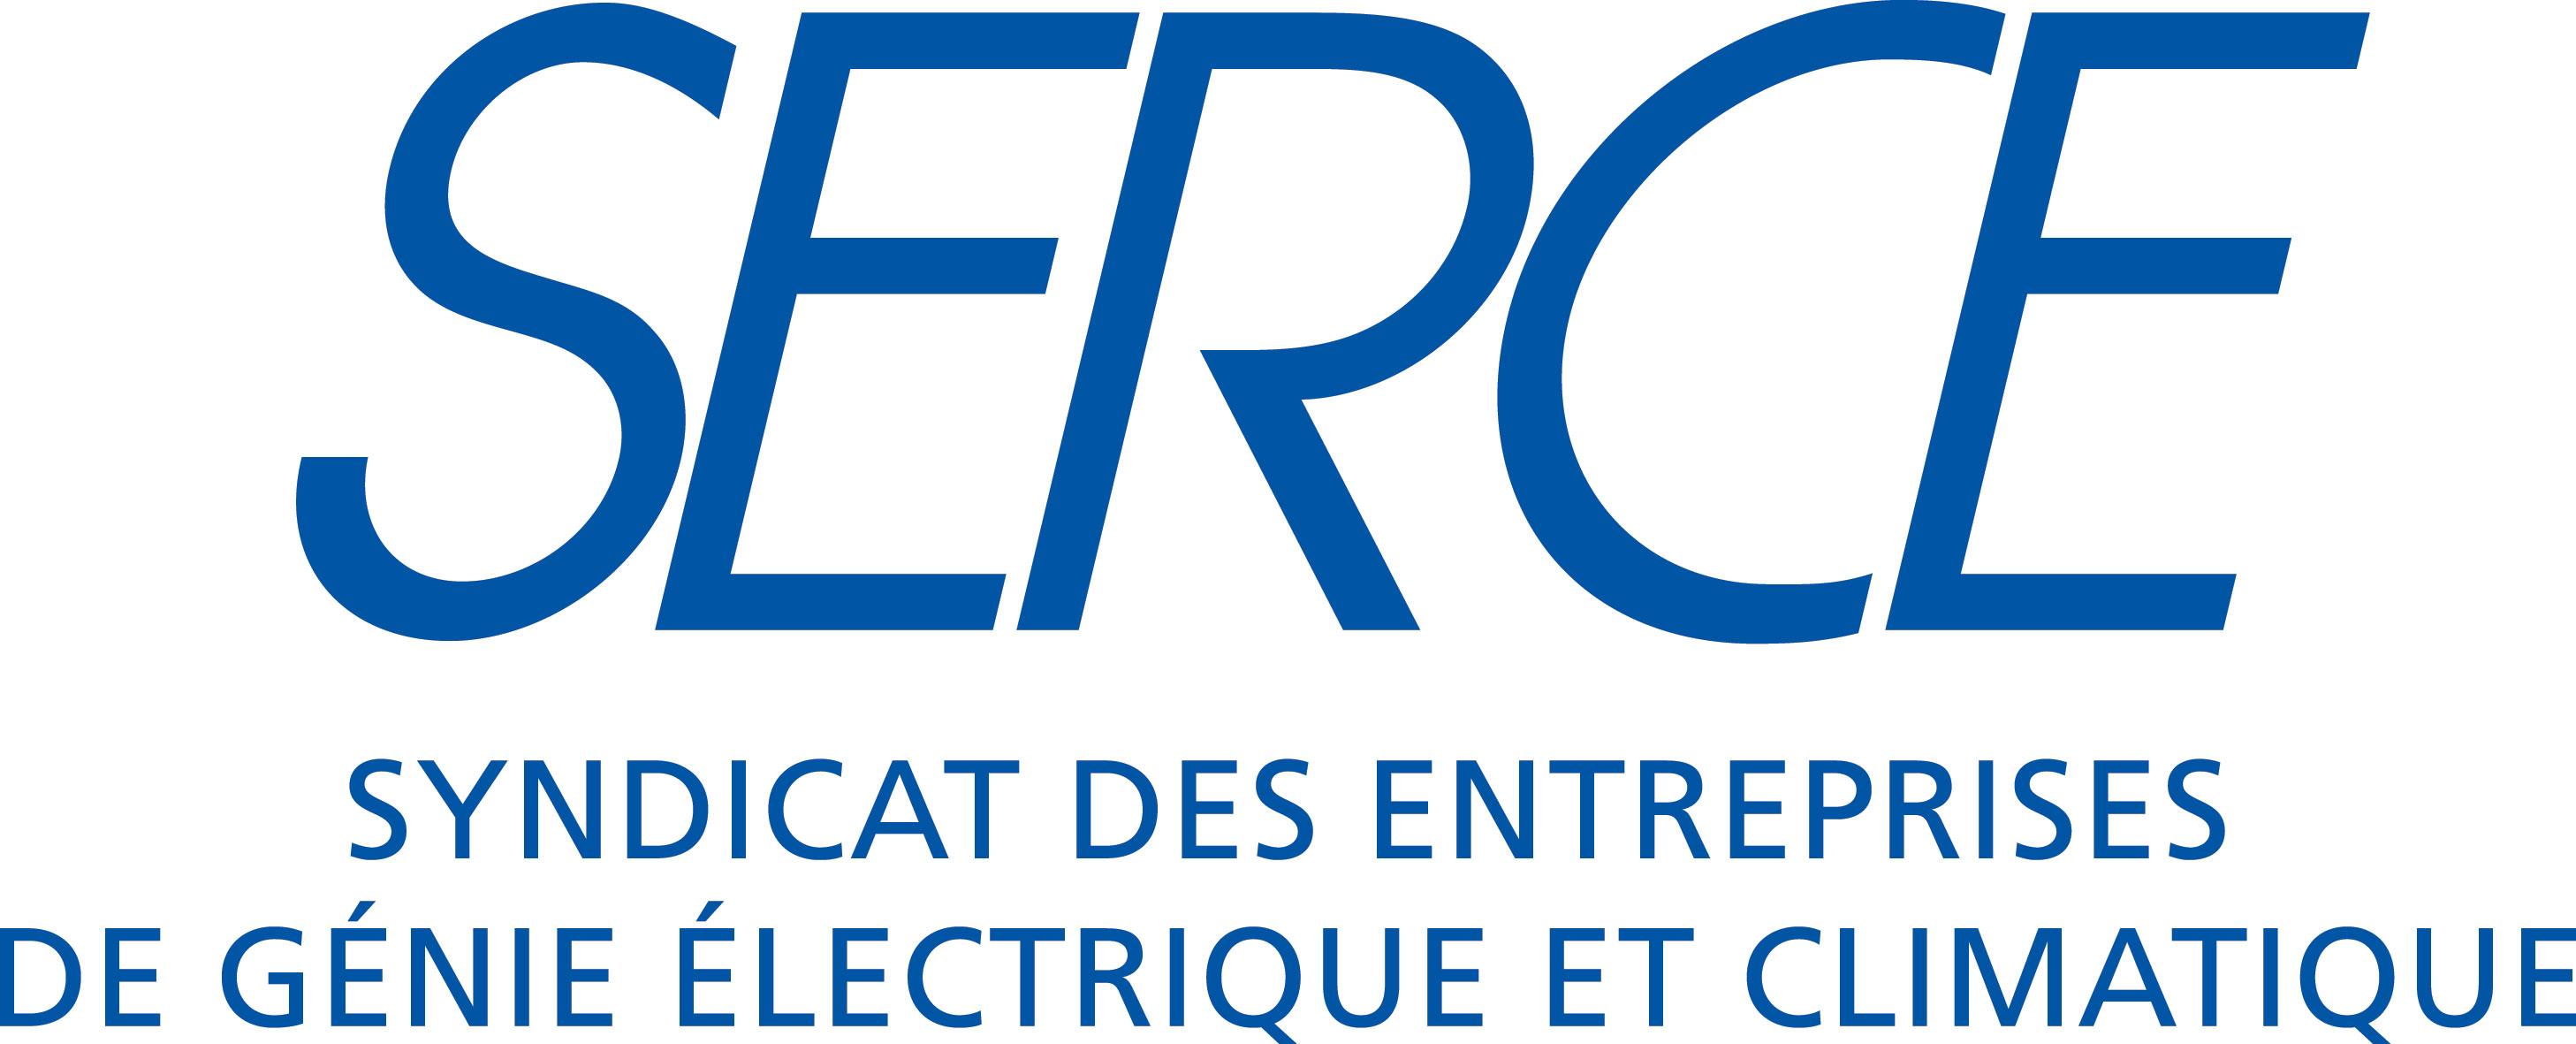 logo SERCE